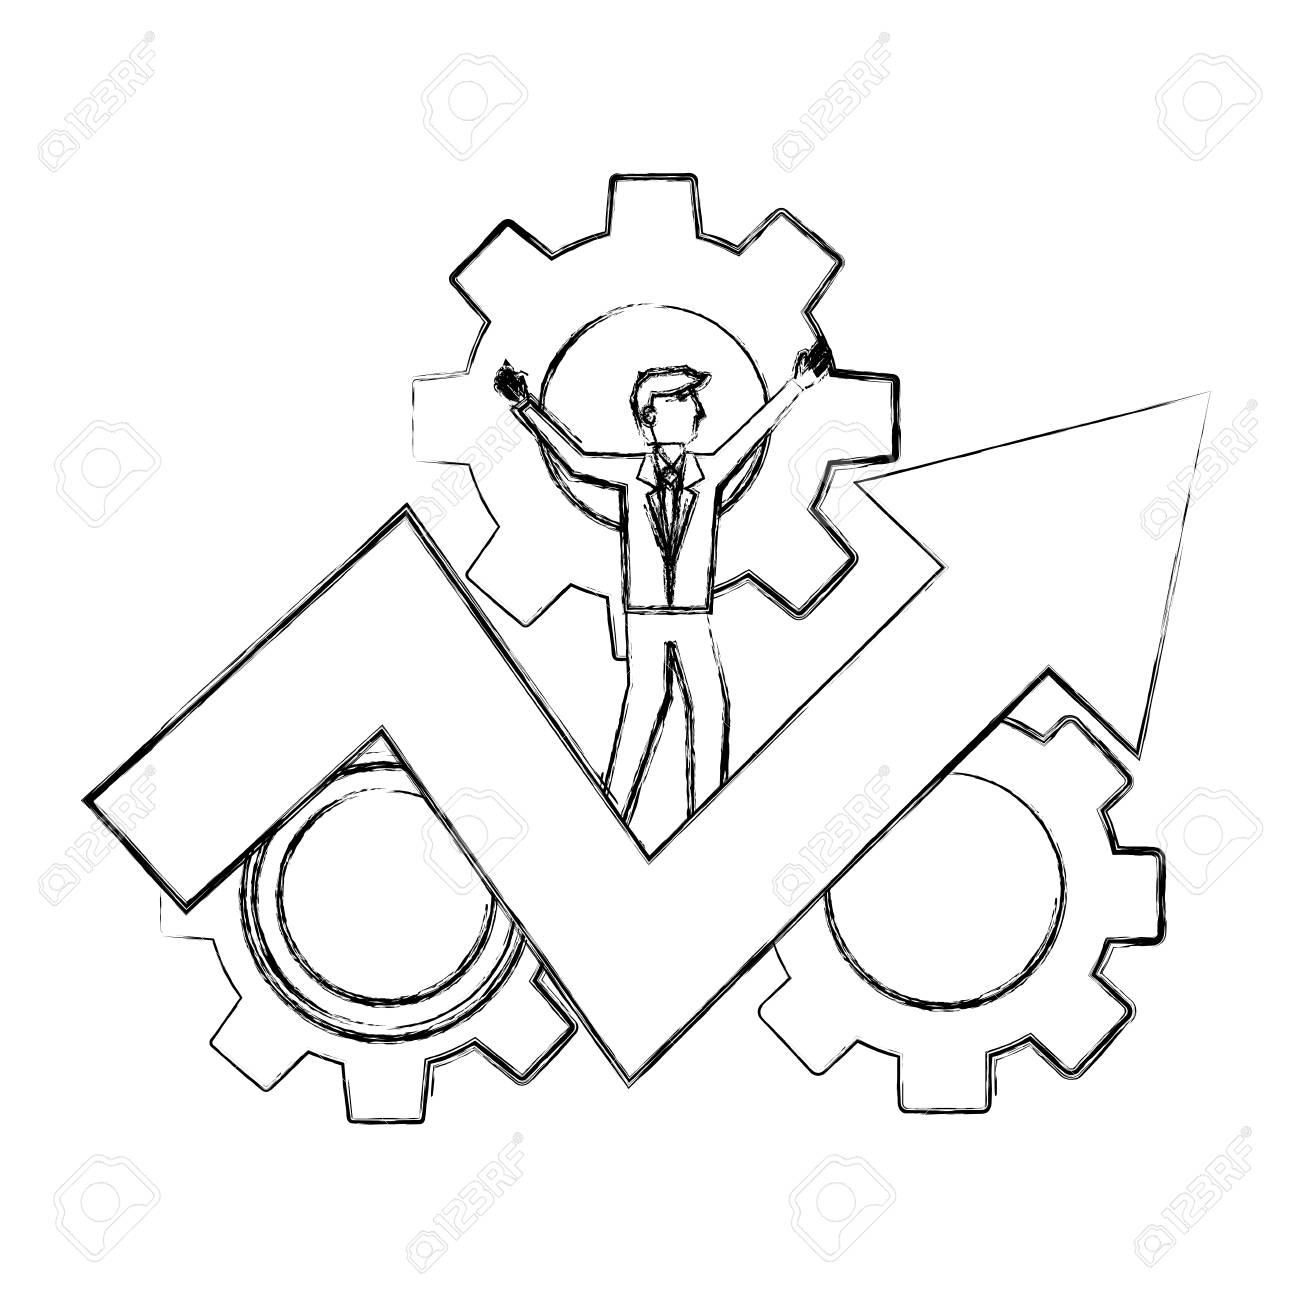 businessman on success arrow business gears vector illustration hand drawing - 106459249